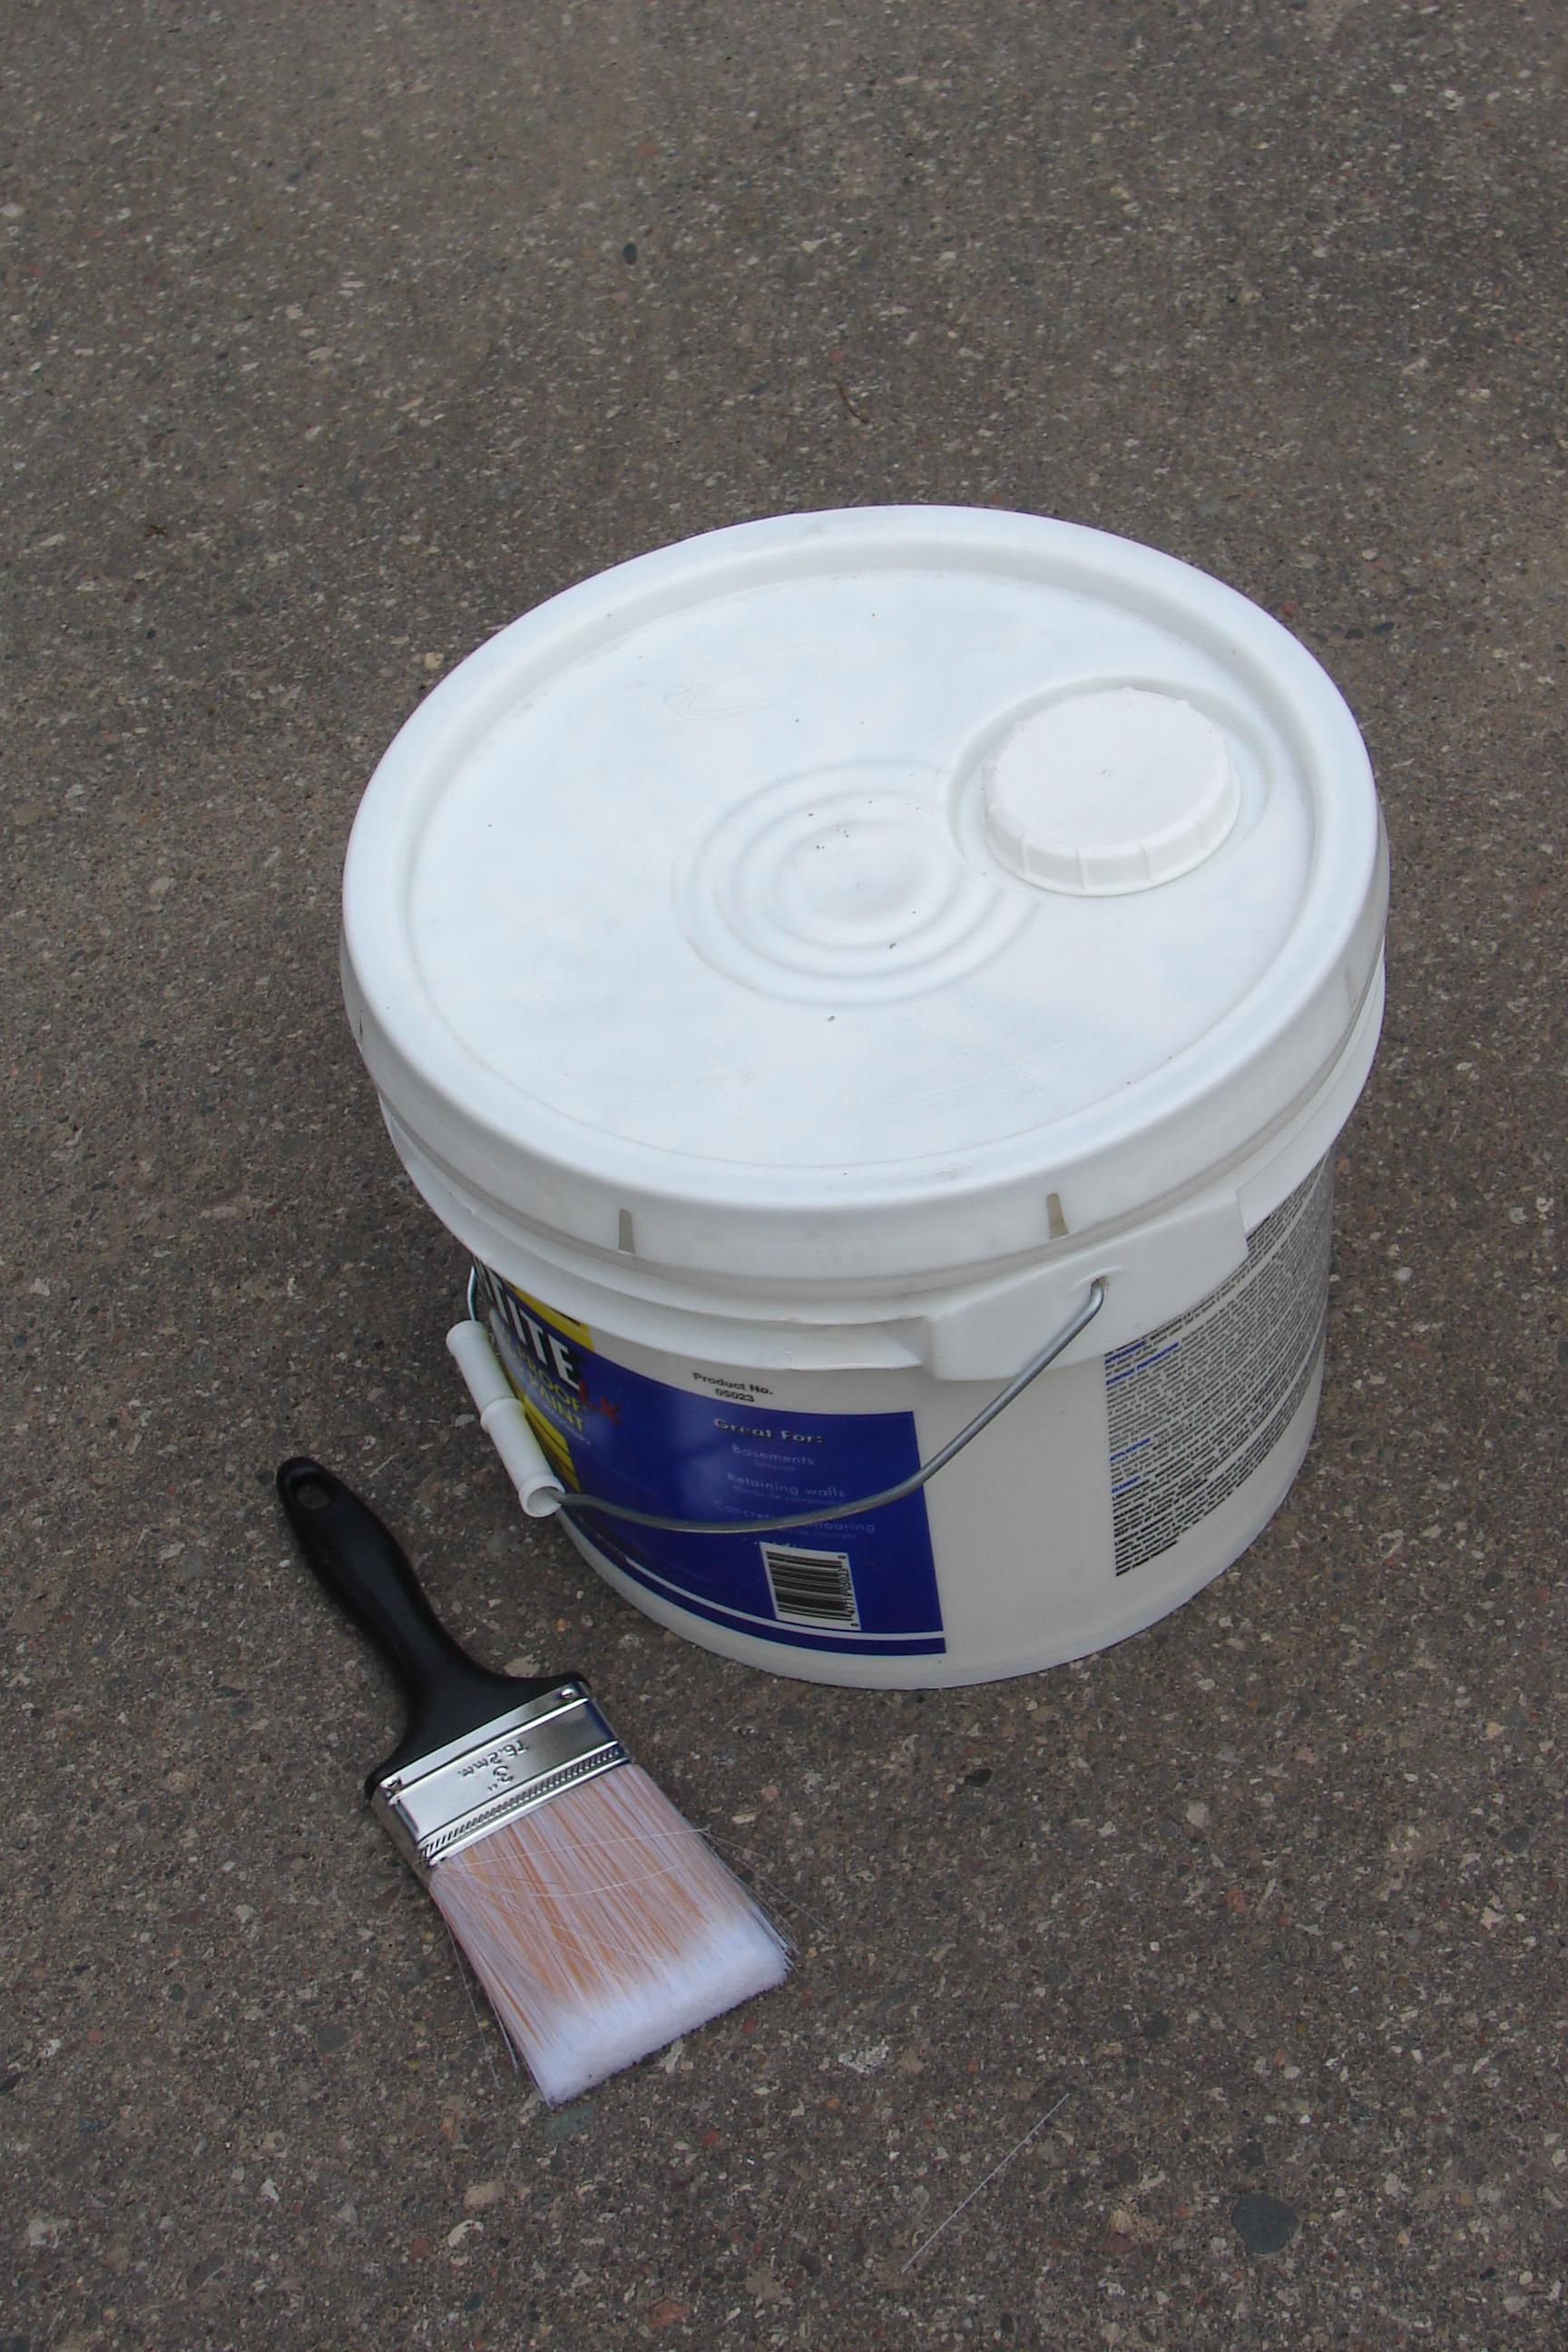 How To Open 5 Gallon Paint Bucket : gallon, paint, bucket, (container), Wikipedia